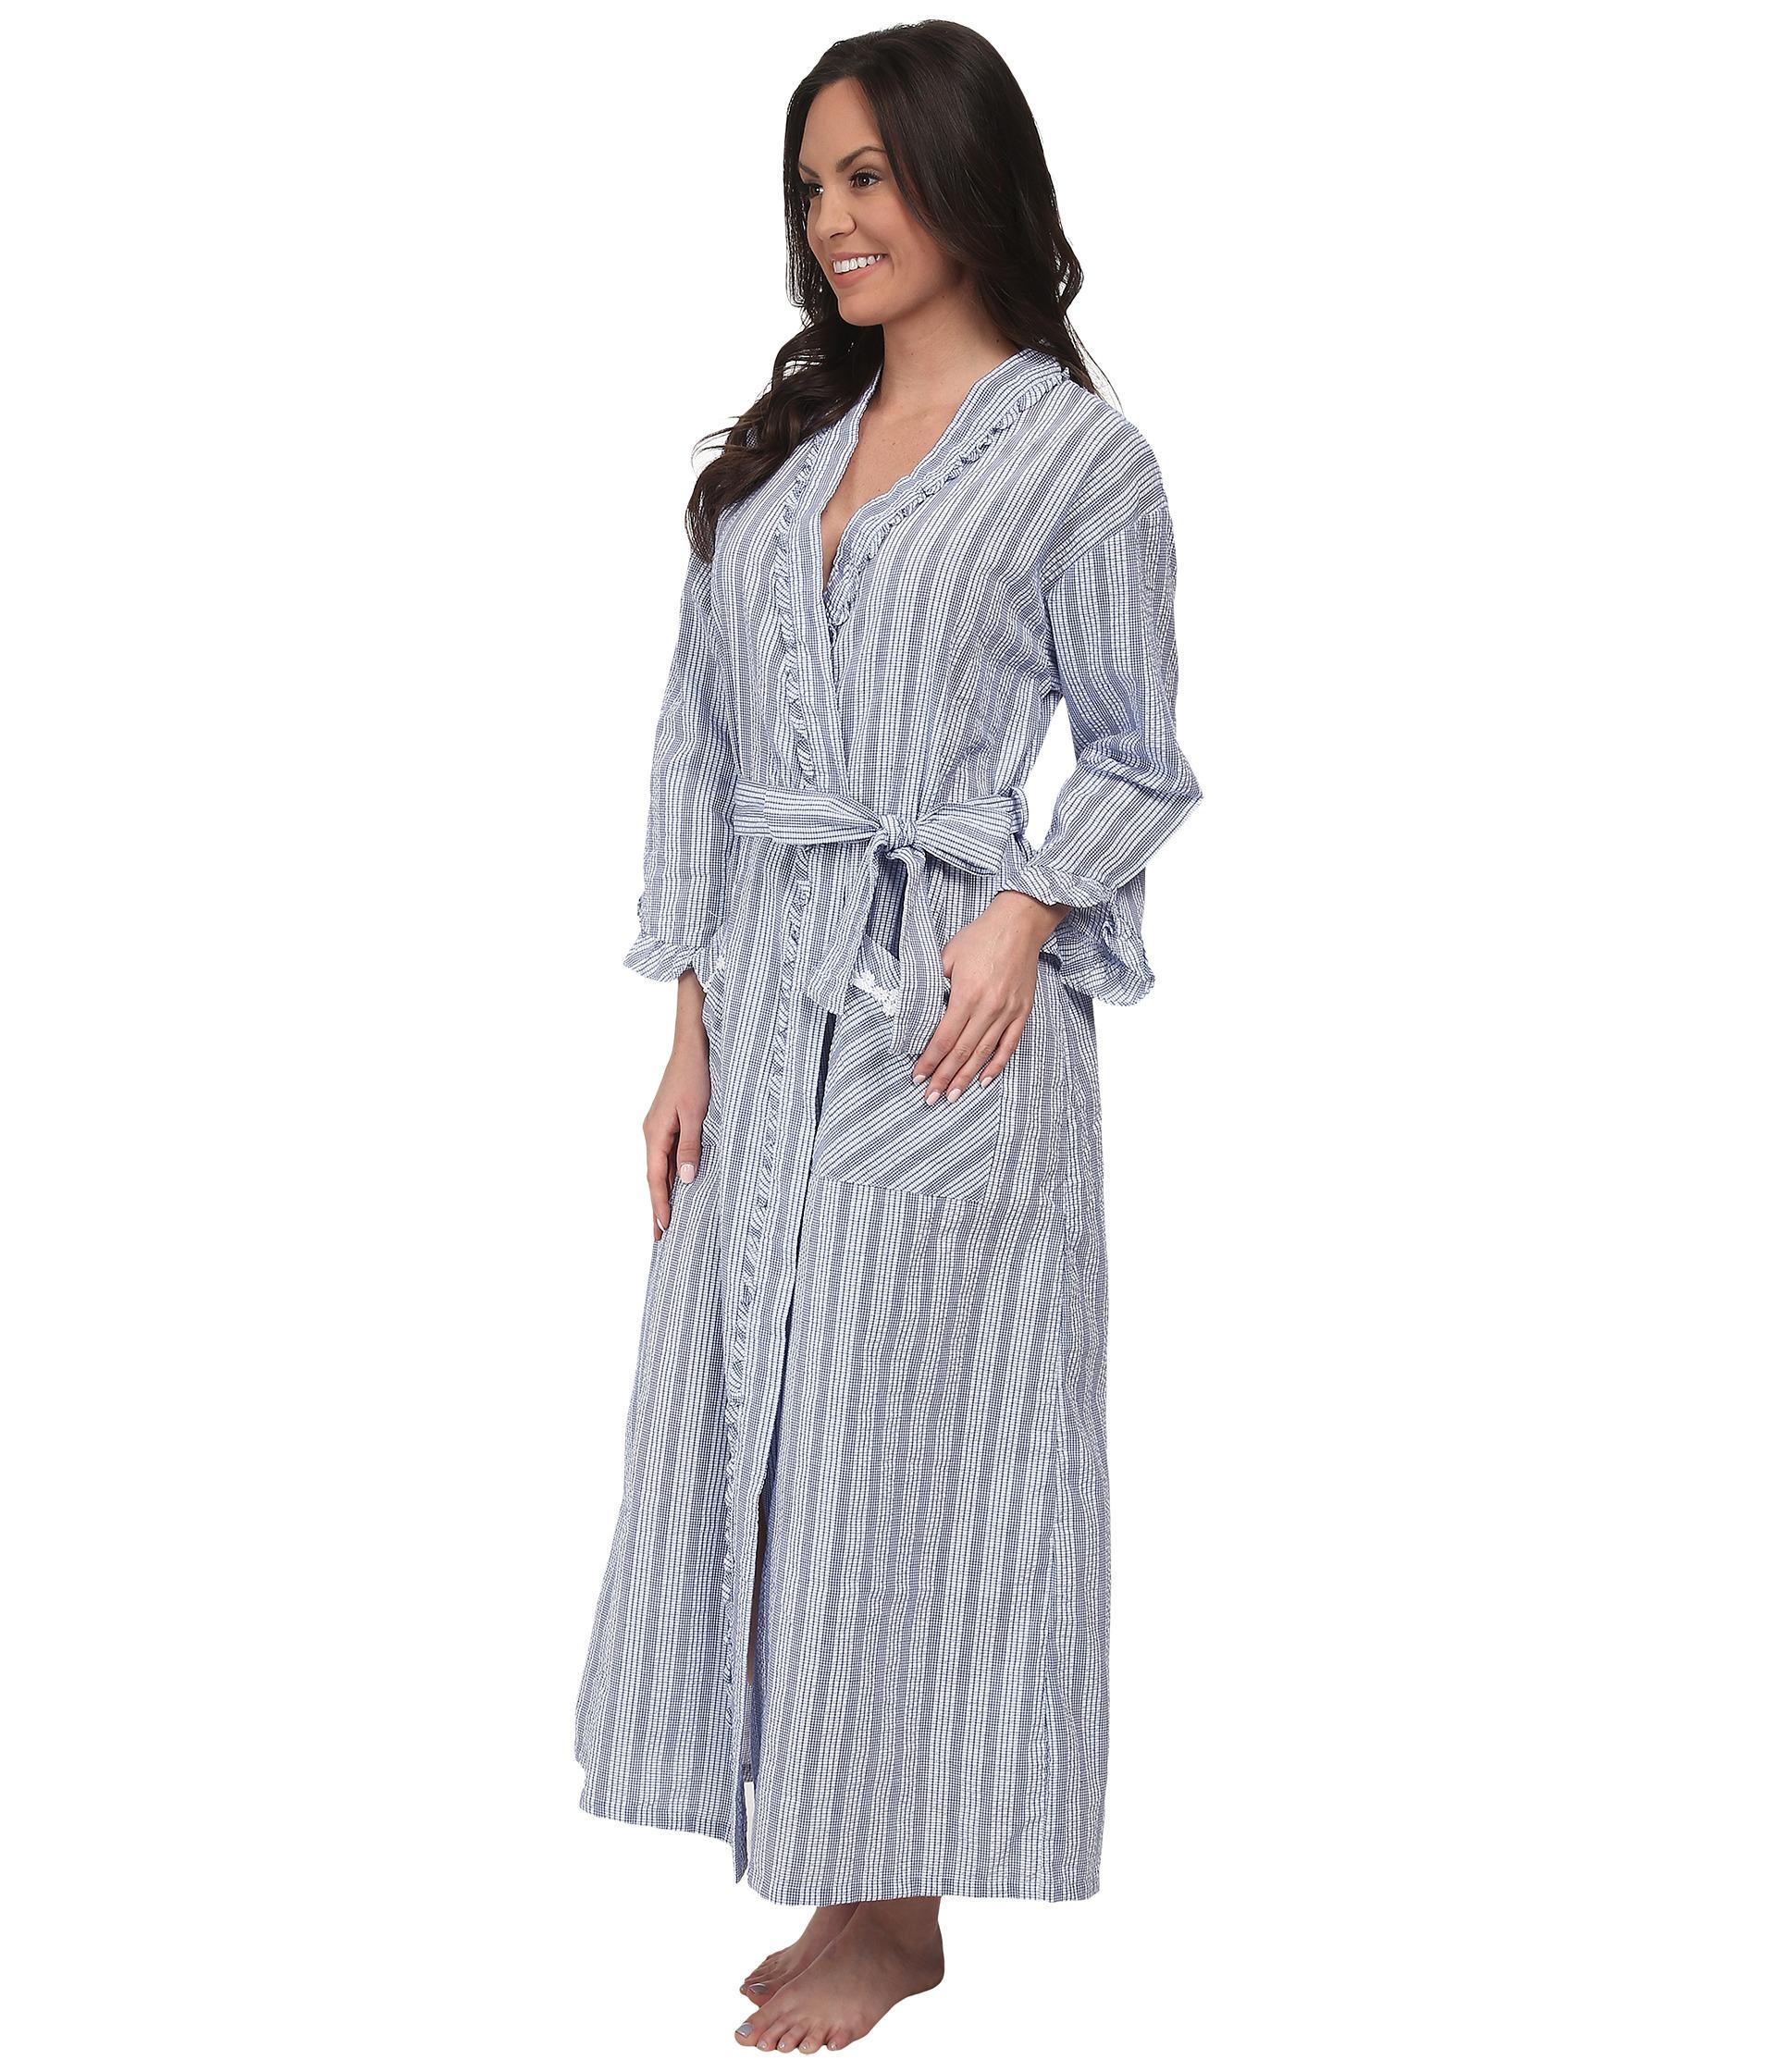 d2b1c18f1b Lyst - Eileen West Summer Days Ballet Wrap Robe in Blue